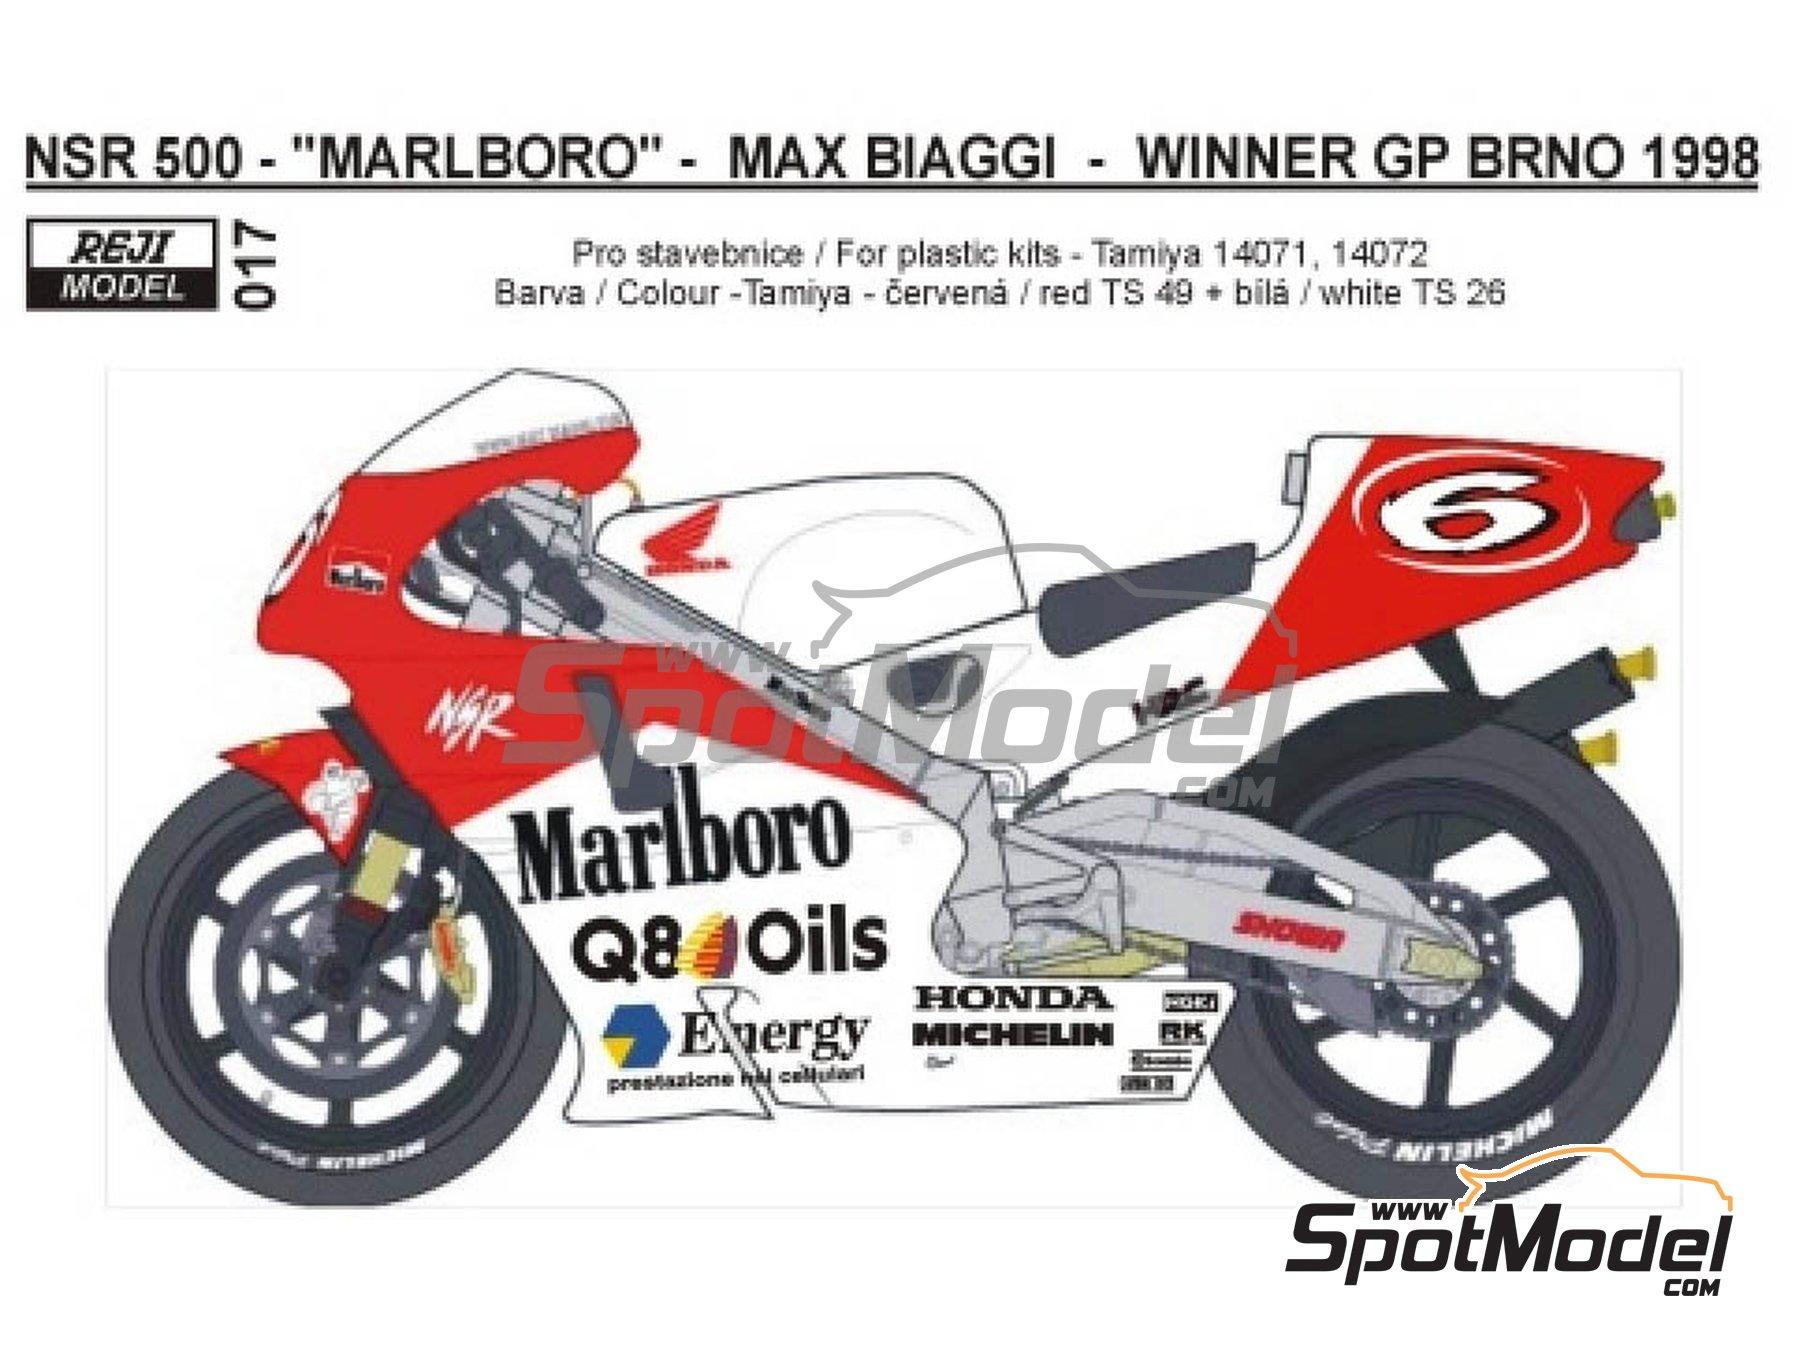 Image 1: Honda NSR500 Marlboro - Brno Formula 1 Grand Prix, Brno Moto GP Grand Prix 1998 | Marking / livery in 1/12 scale manufactured by Reji Model (ref.REJI-017)